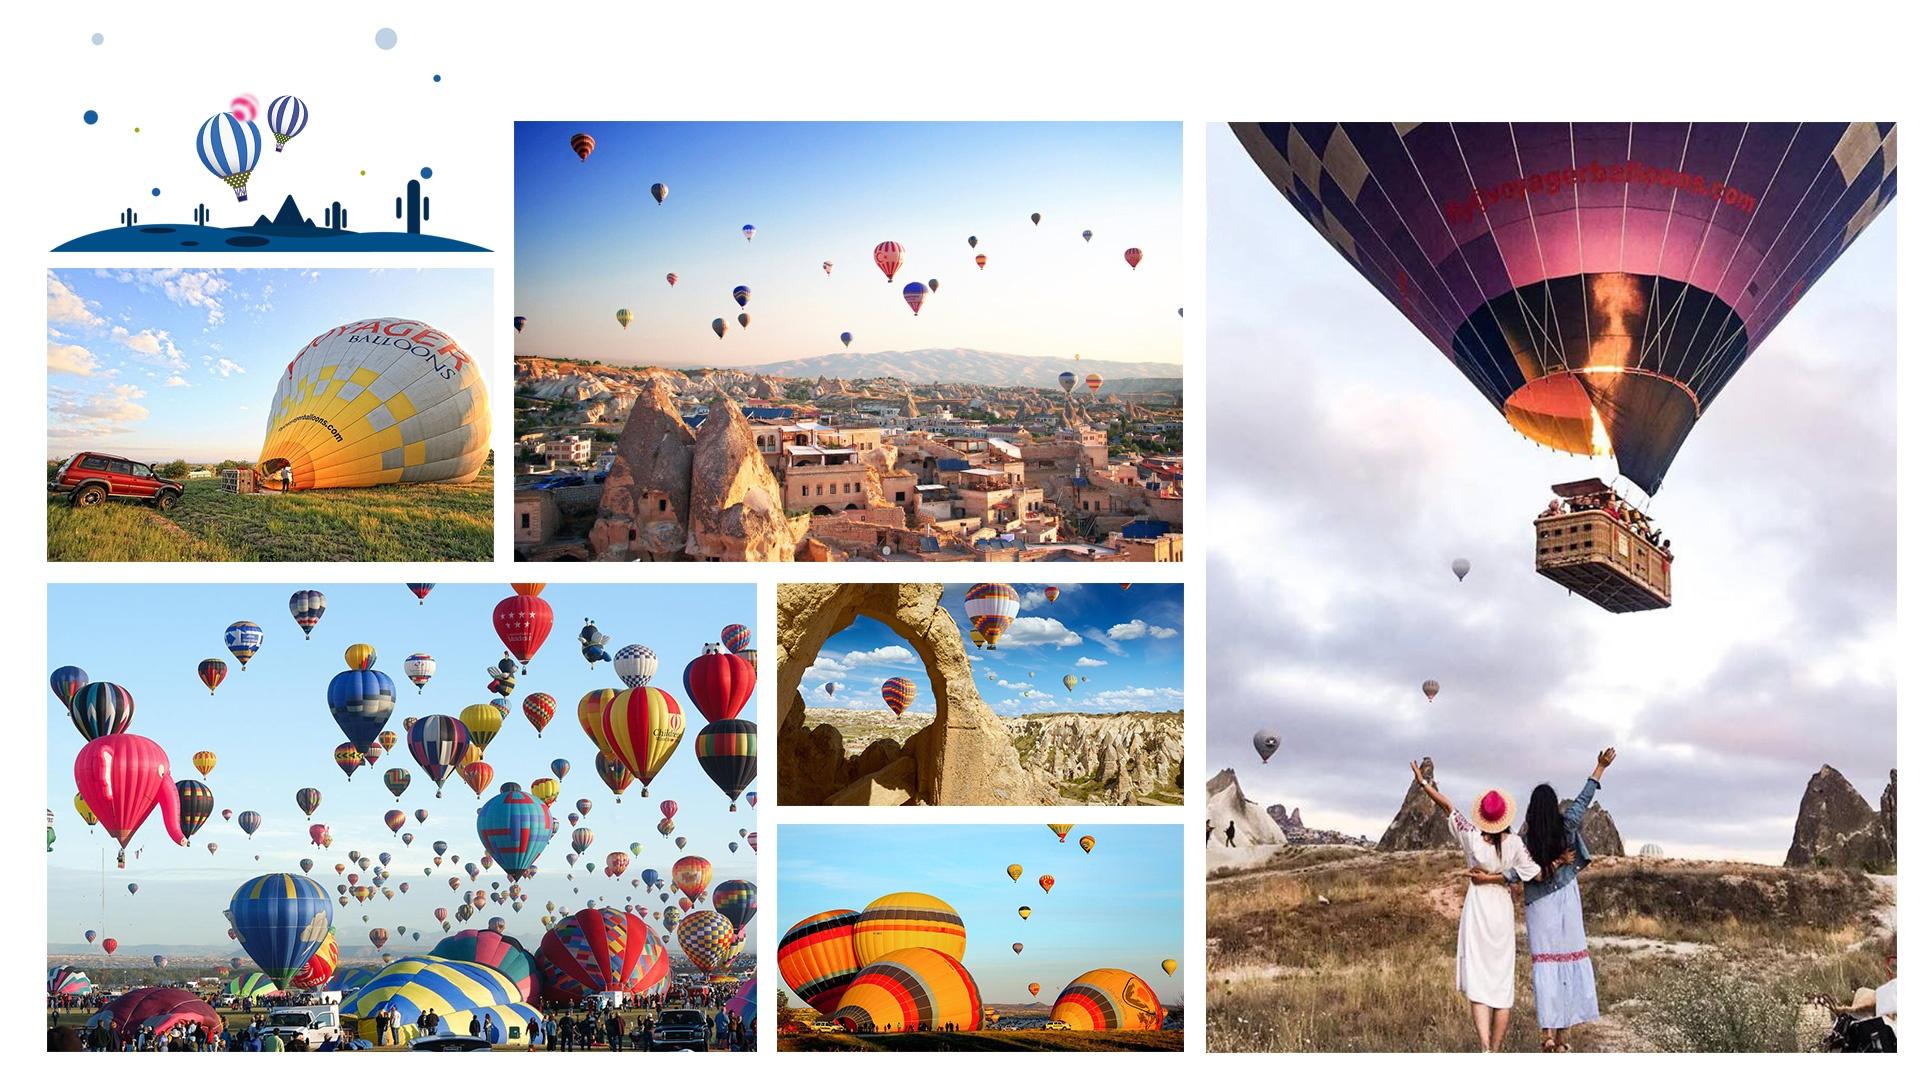 Den Cappadocia ngam khi cau khong lo tren bau troi cao nguyen hinh anh 5